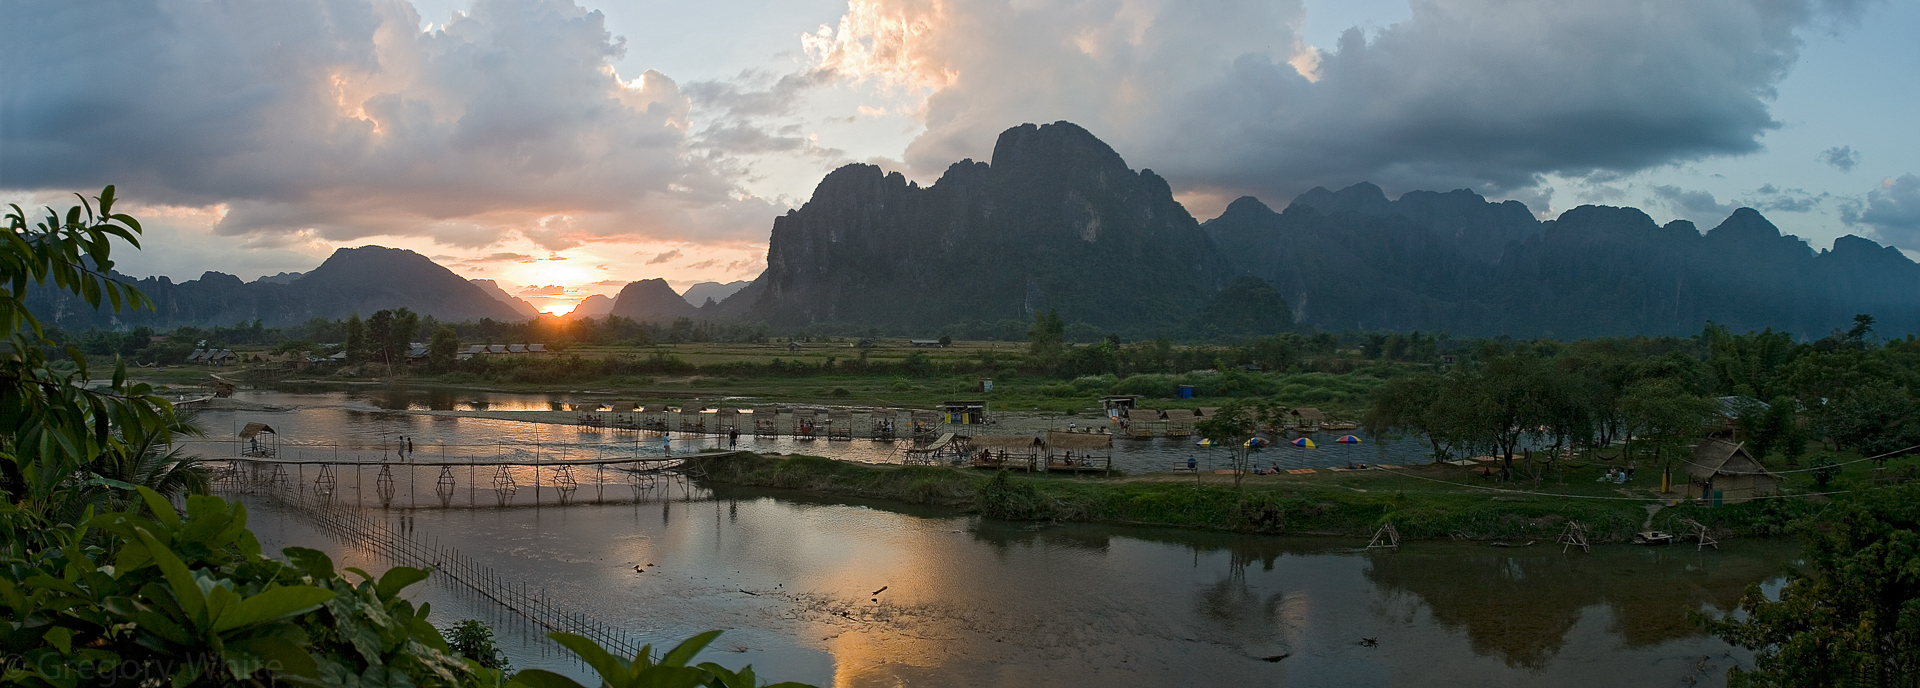 Sunset in Vang Vien, Laos.